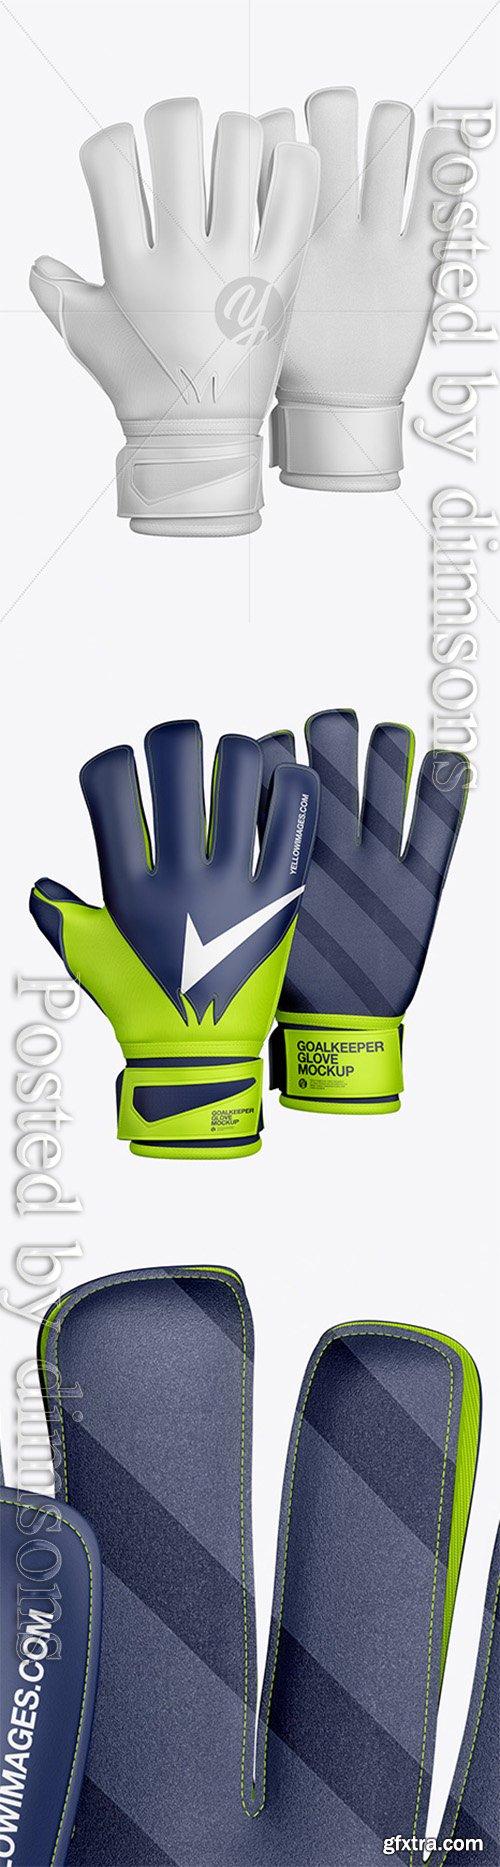 Goalkeeper Gloves Mockup 39972